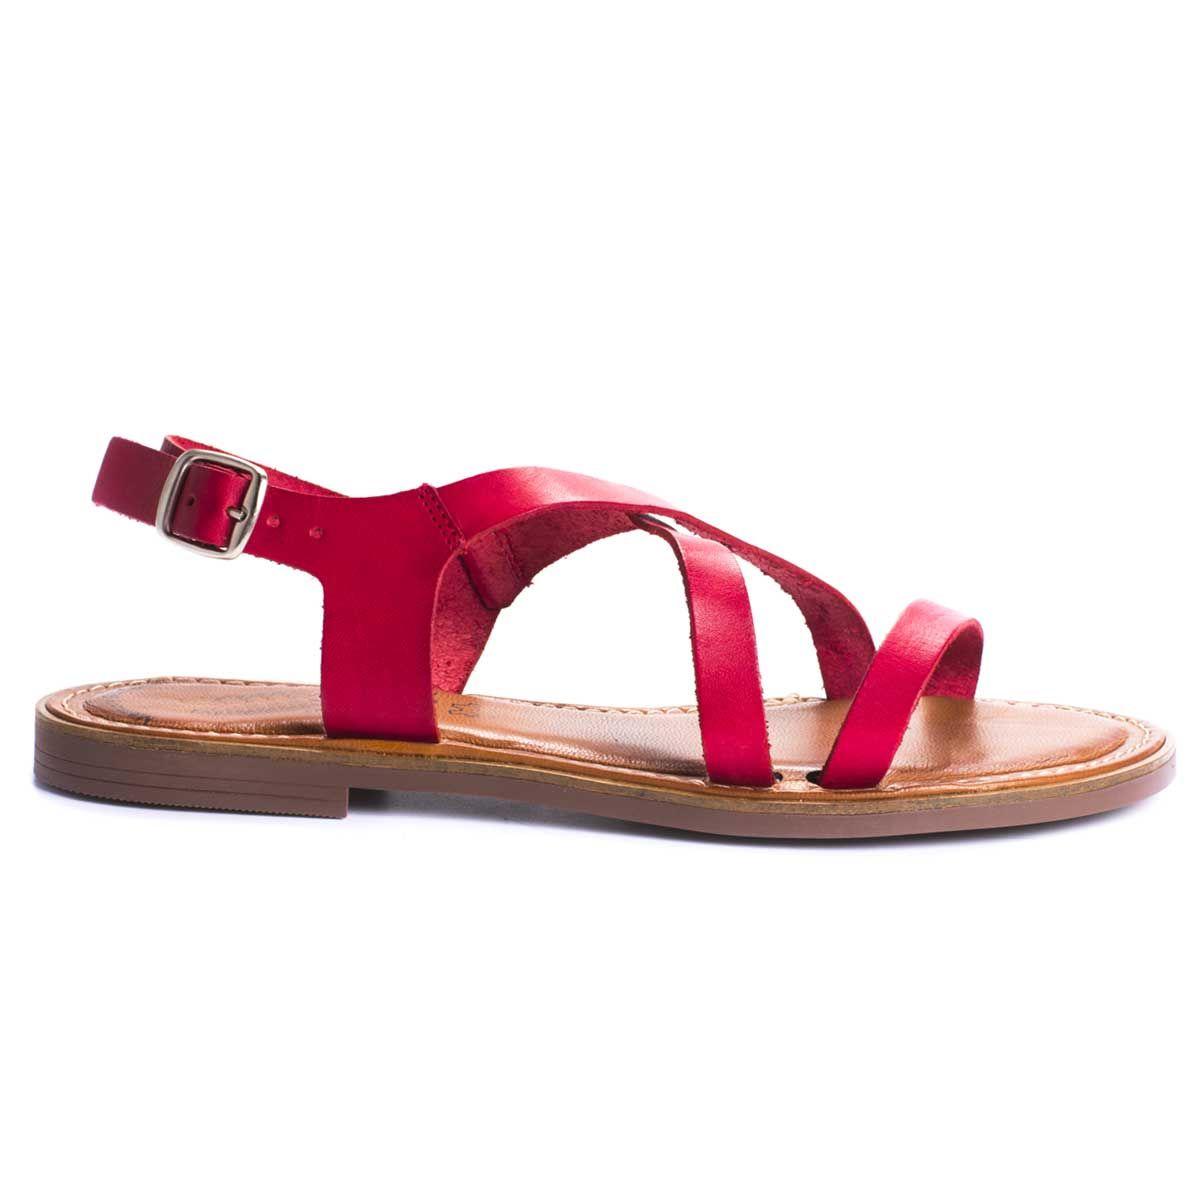 Purapiel Strappy Flat Sandal in Red